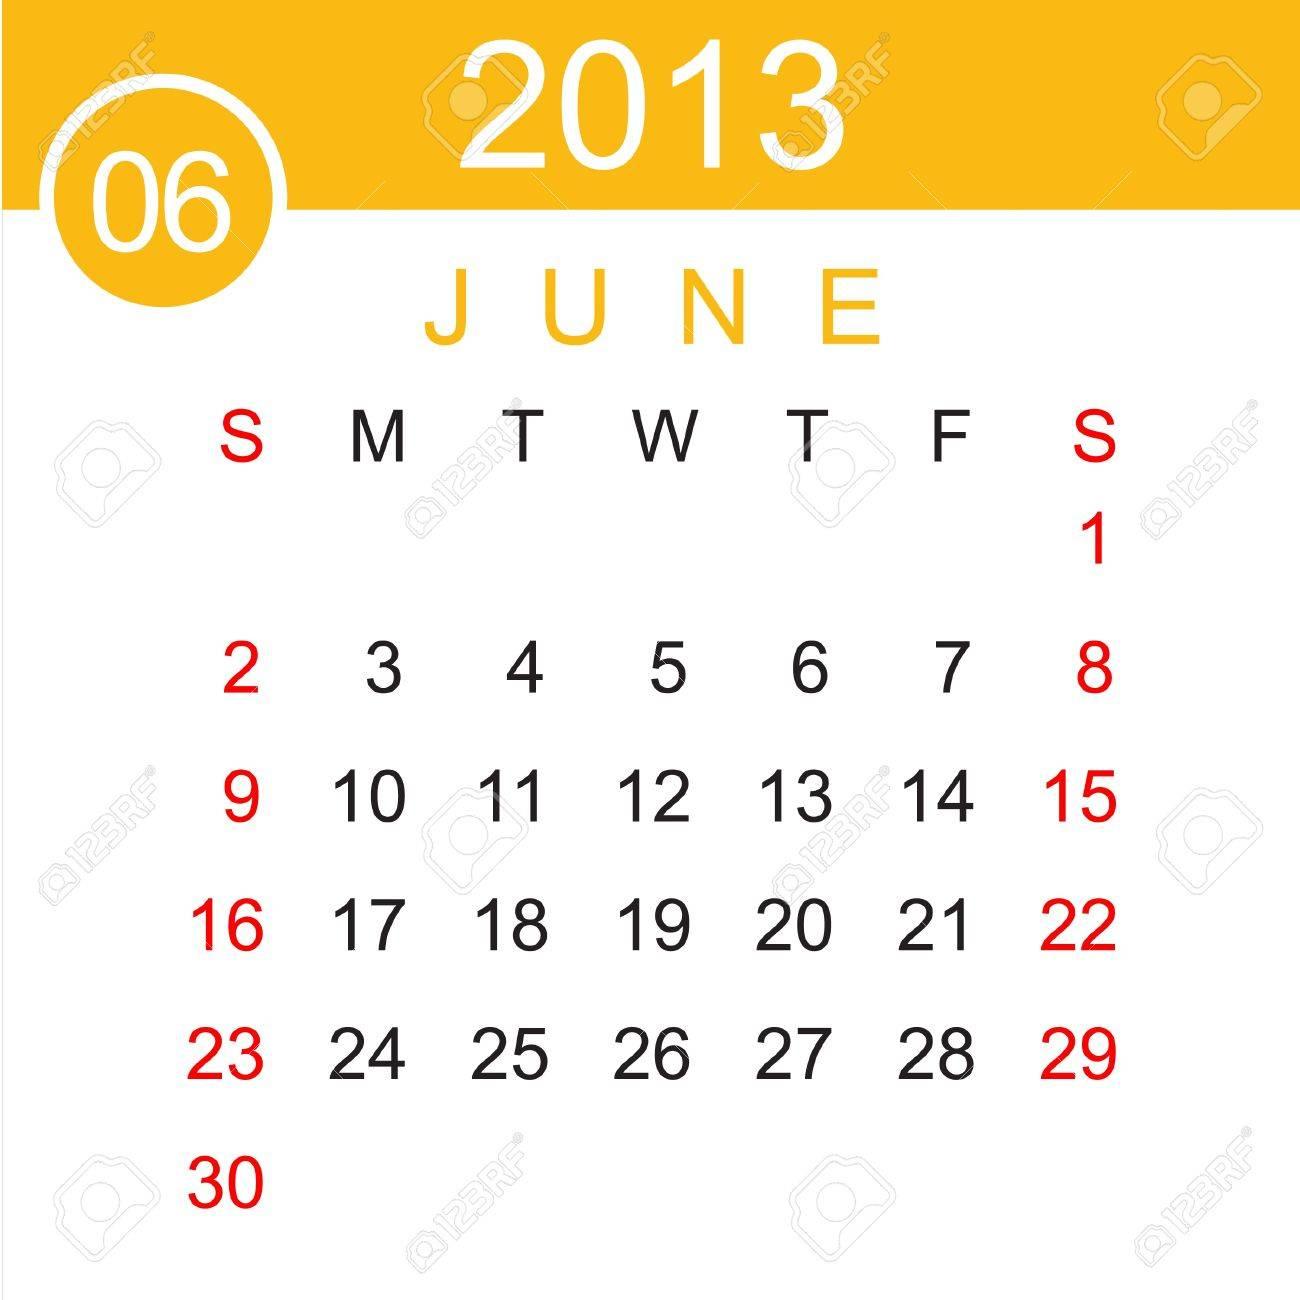 June 2013 Calendar Stock Vector - 15883486